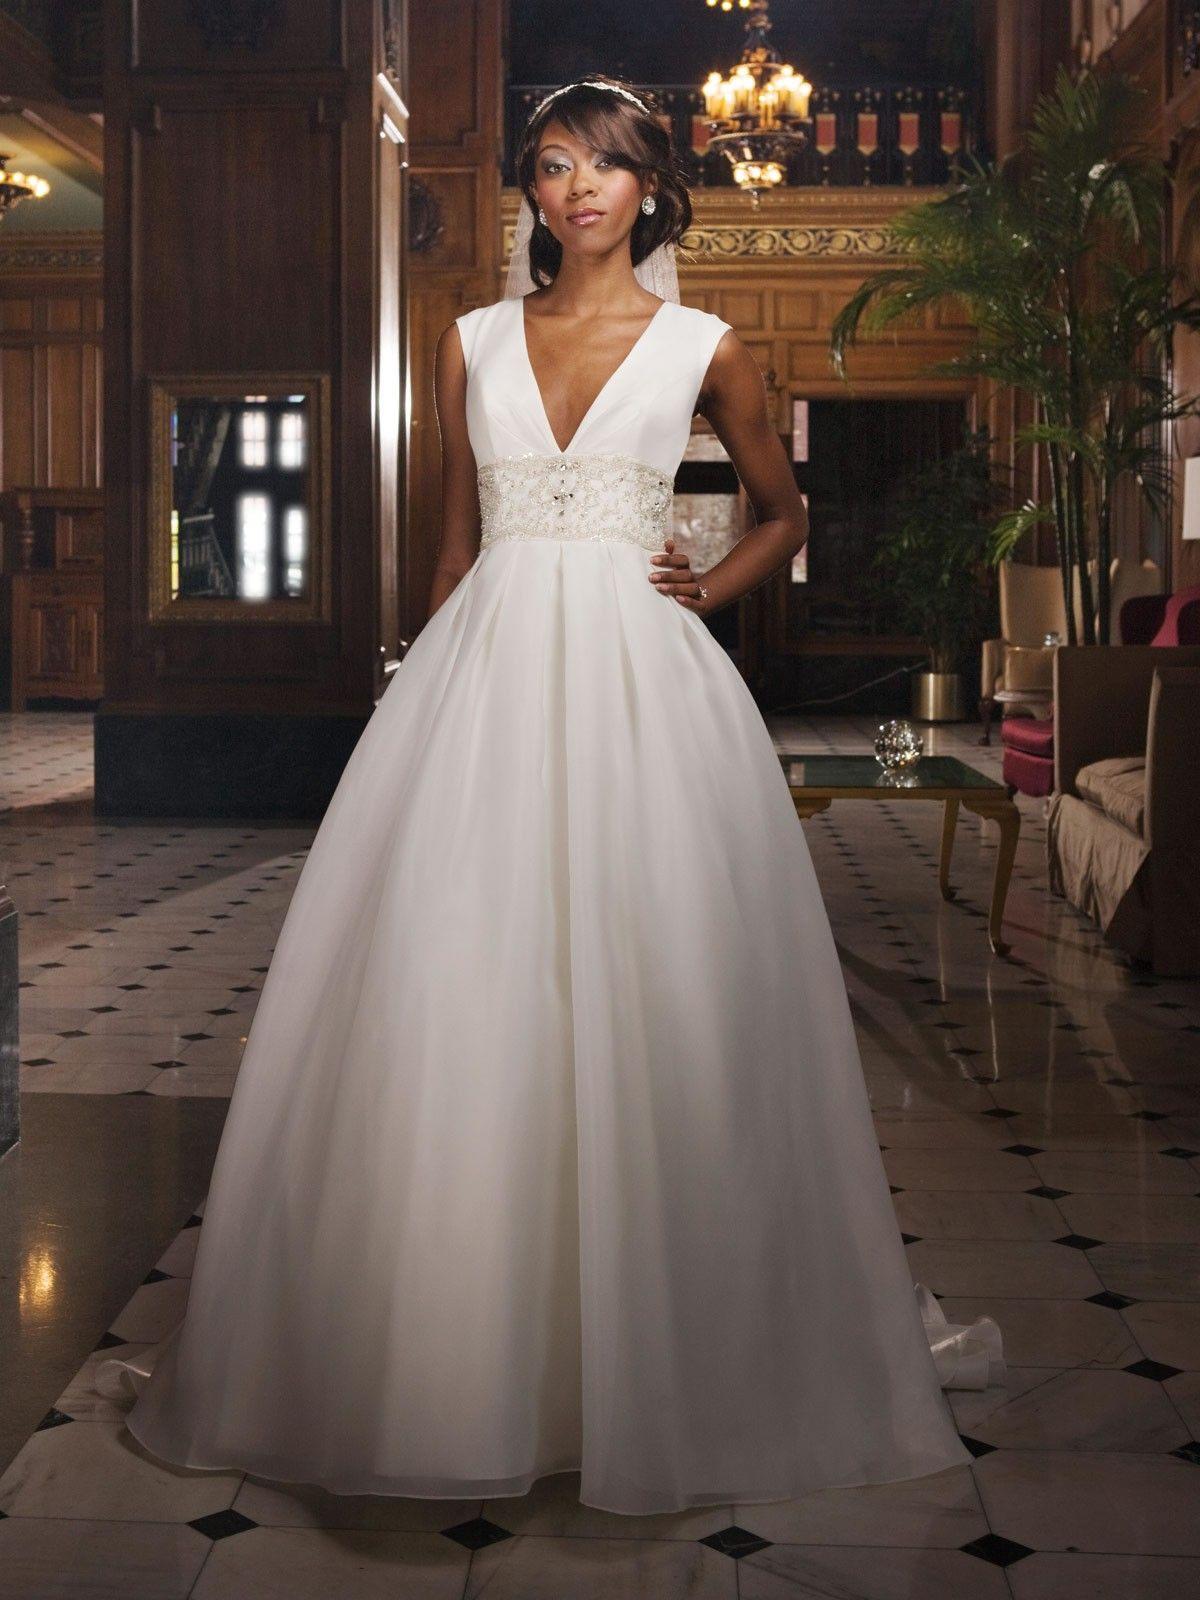 plunging neckline wedding dress Plunging Deep V Neckline Full Box Pleated Bodice Ball Gown Wedding Dress